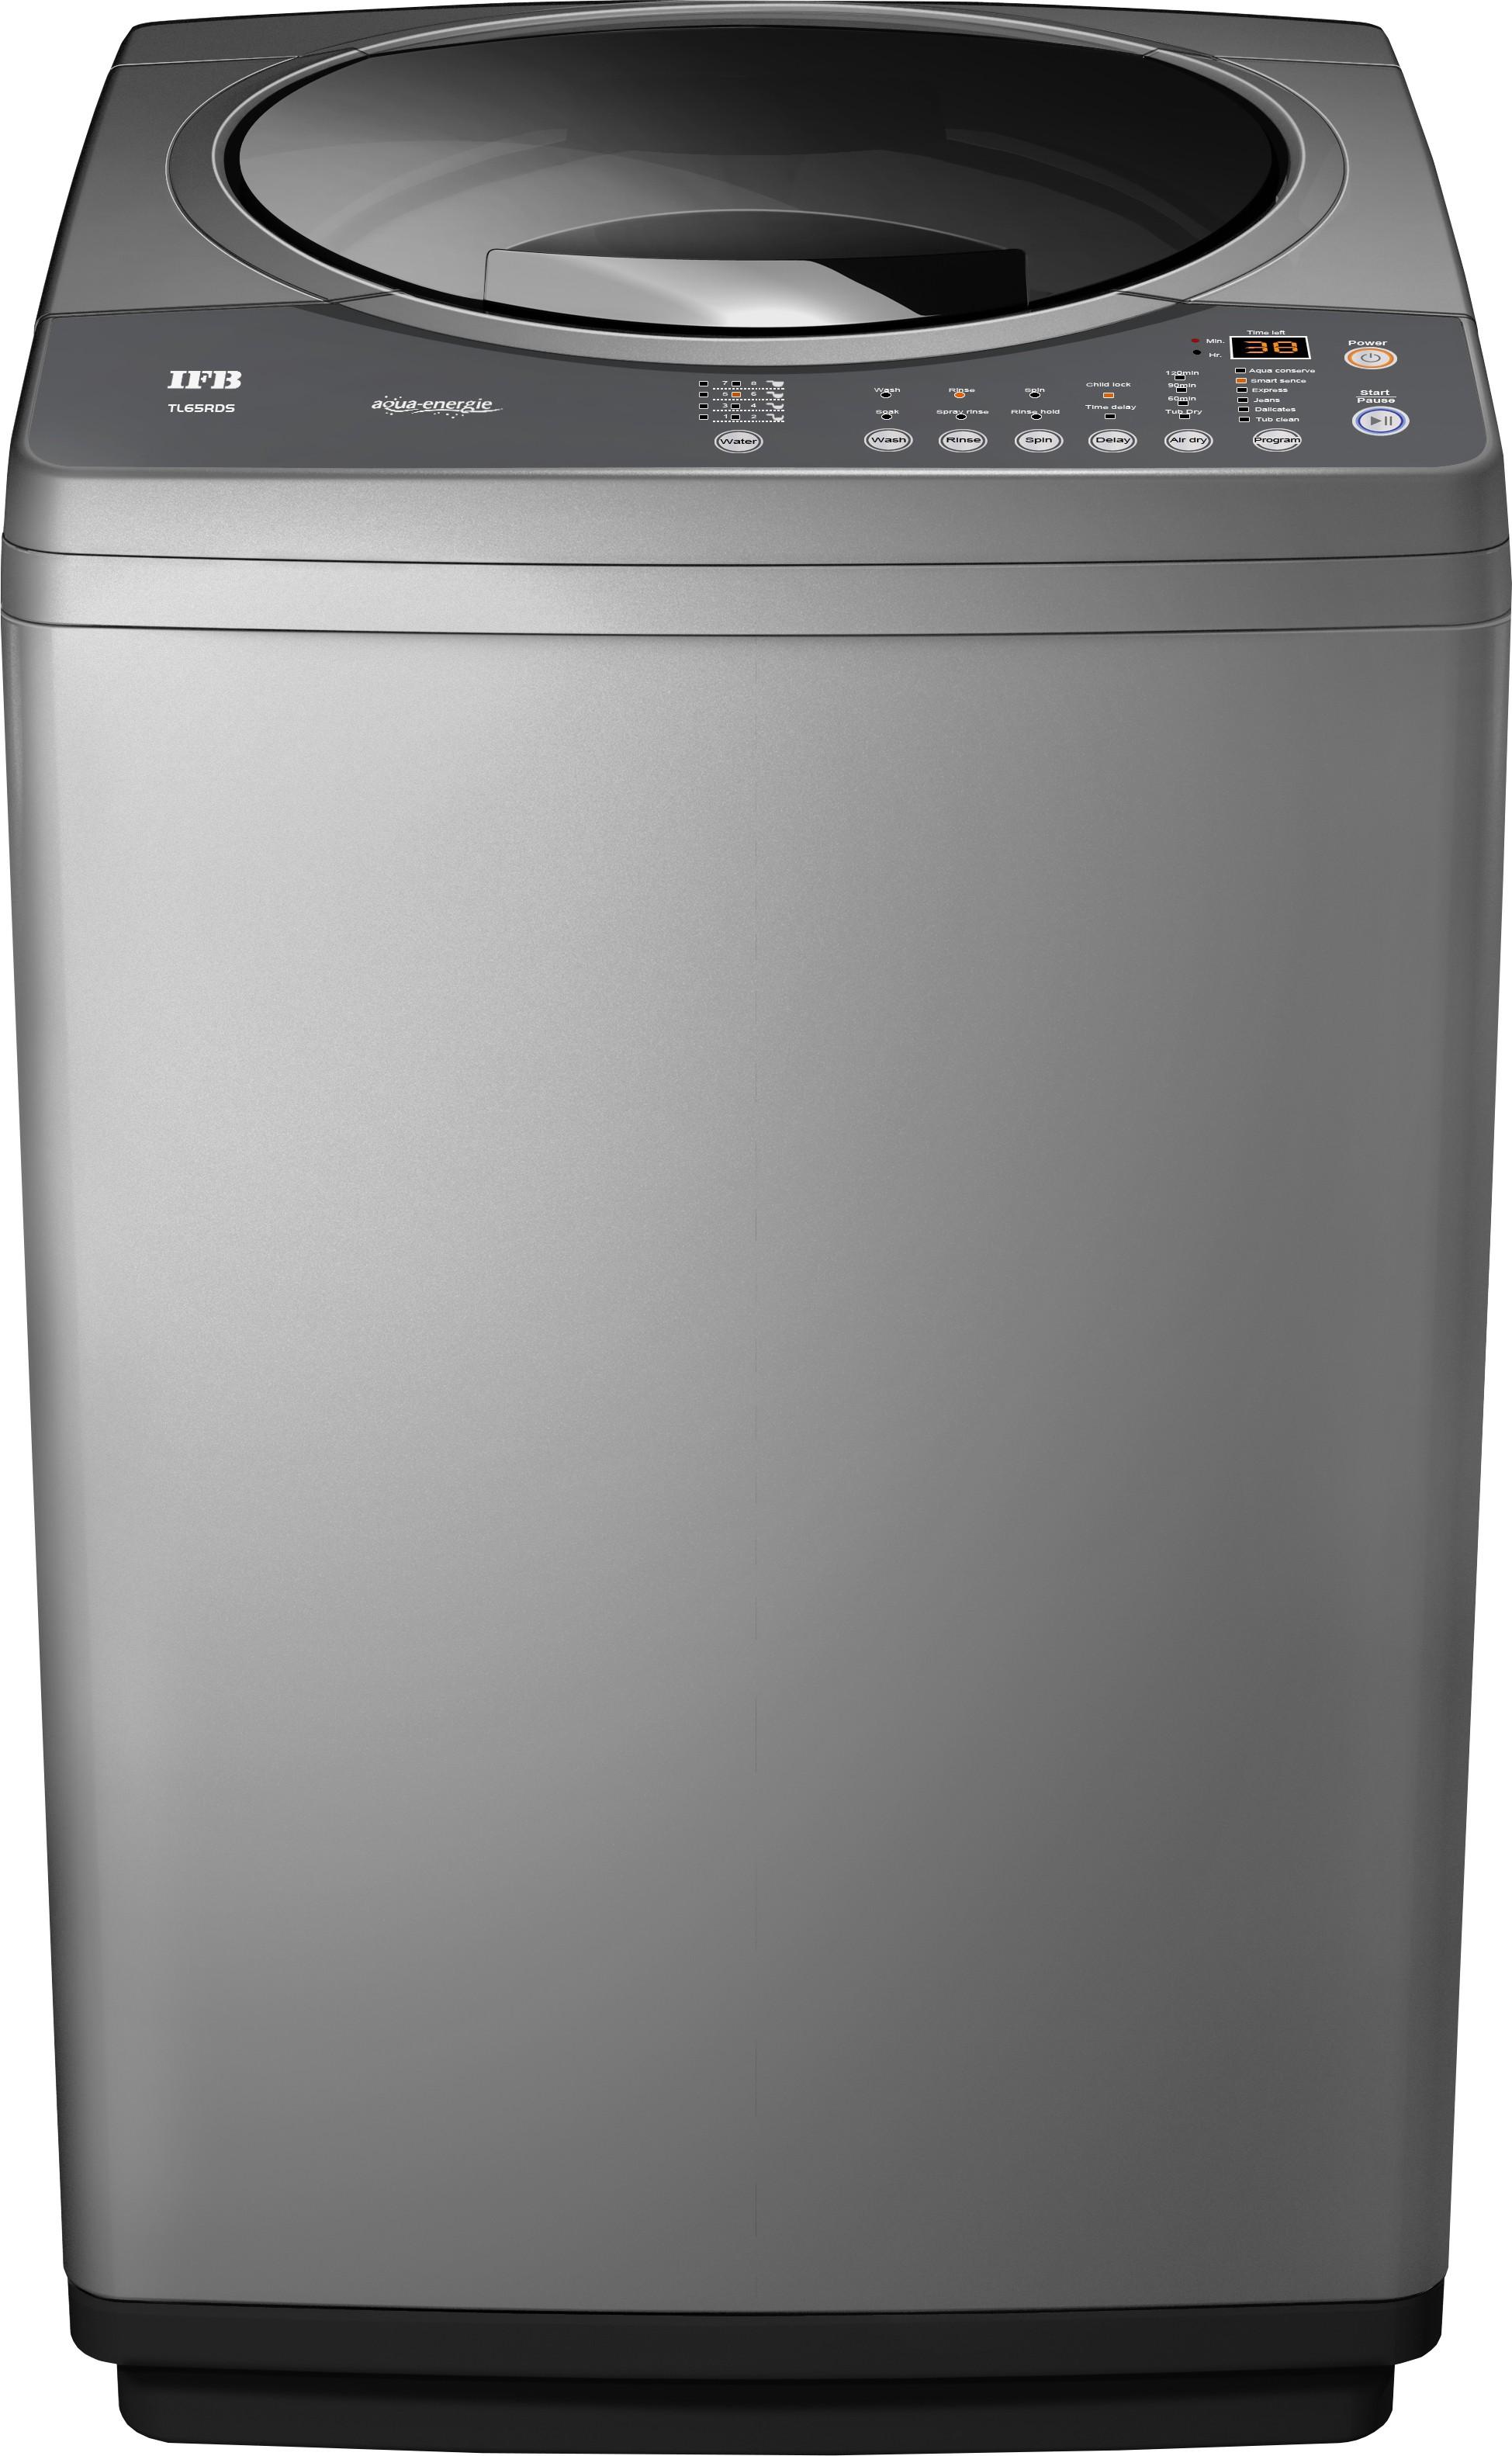 IFB 6.5 kg Fully Automatic Top Loading Washing Machine (IFB)  Buy Online